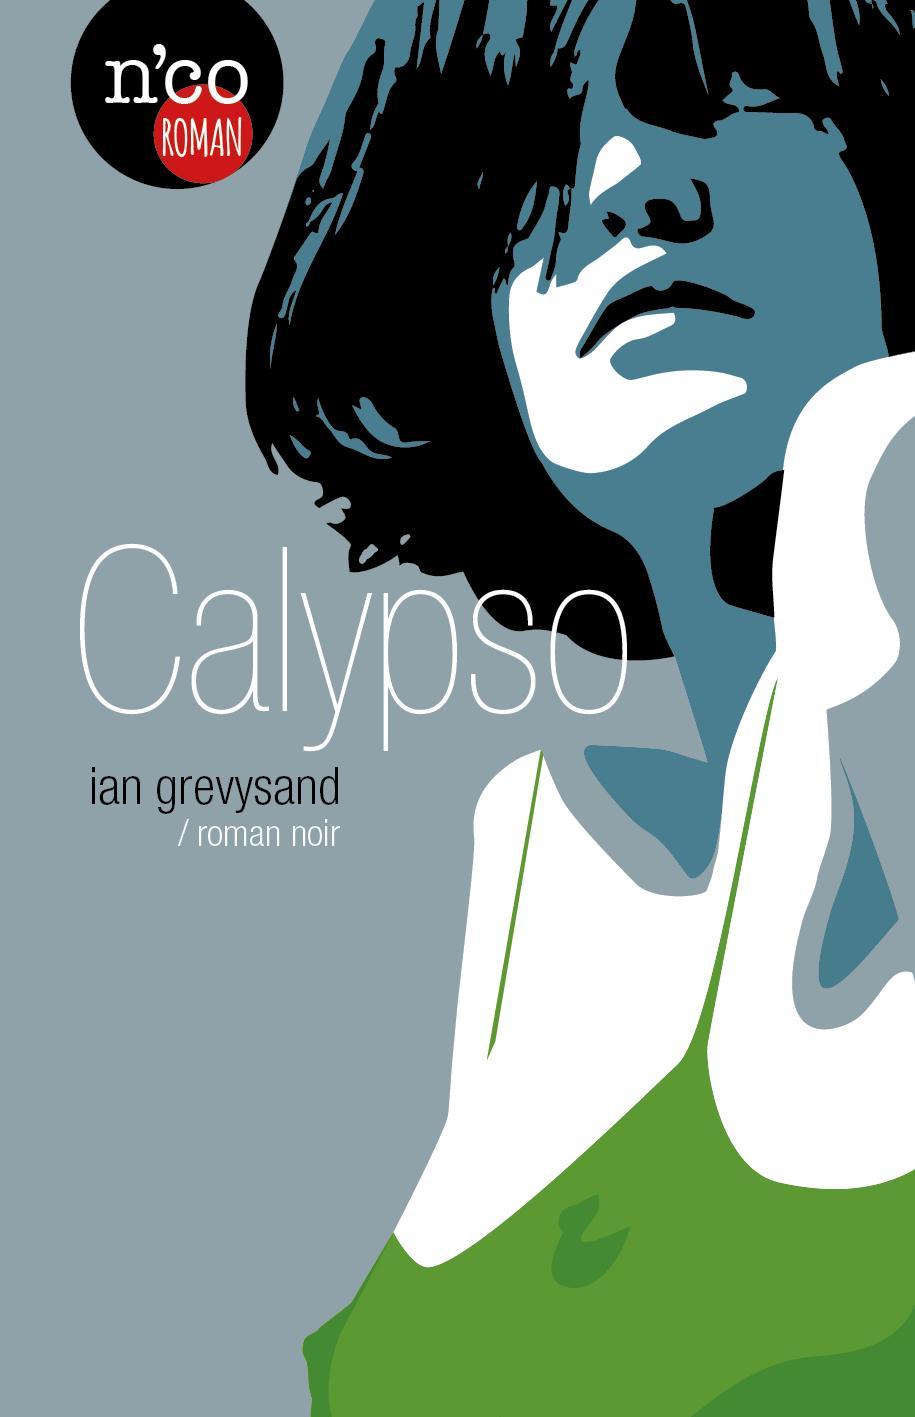 N co calypso grevysand a5 couv